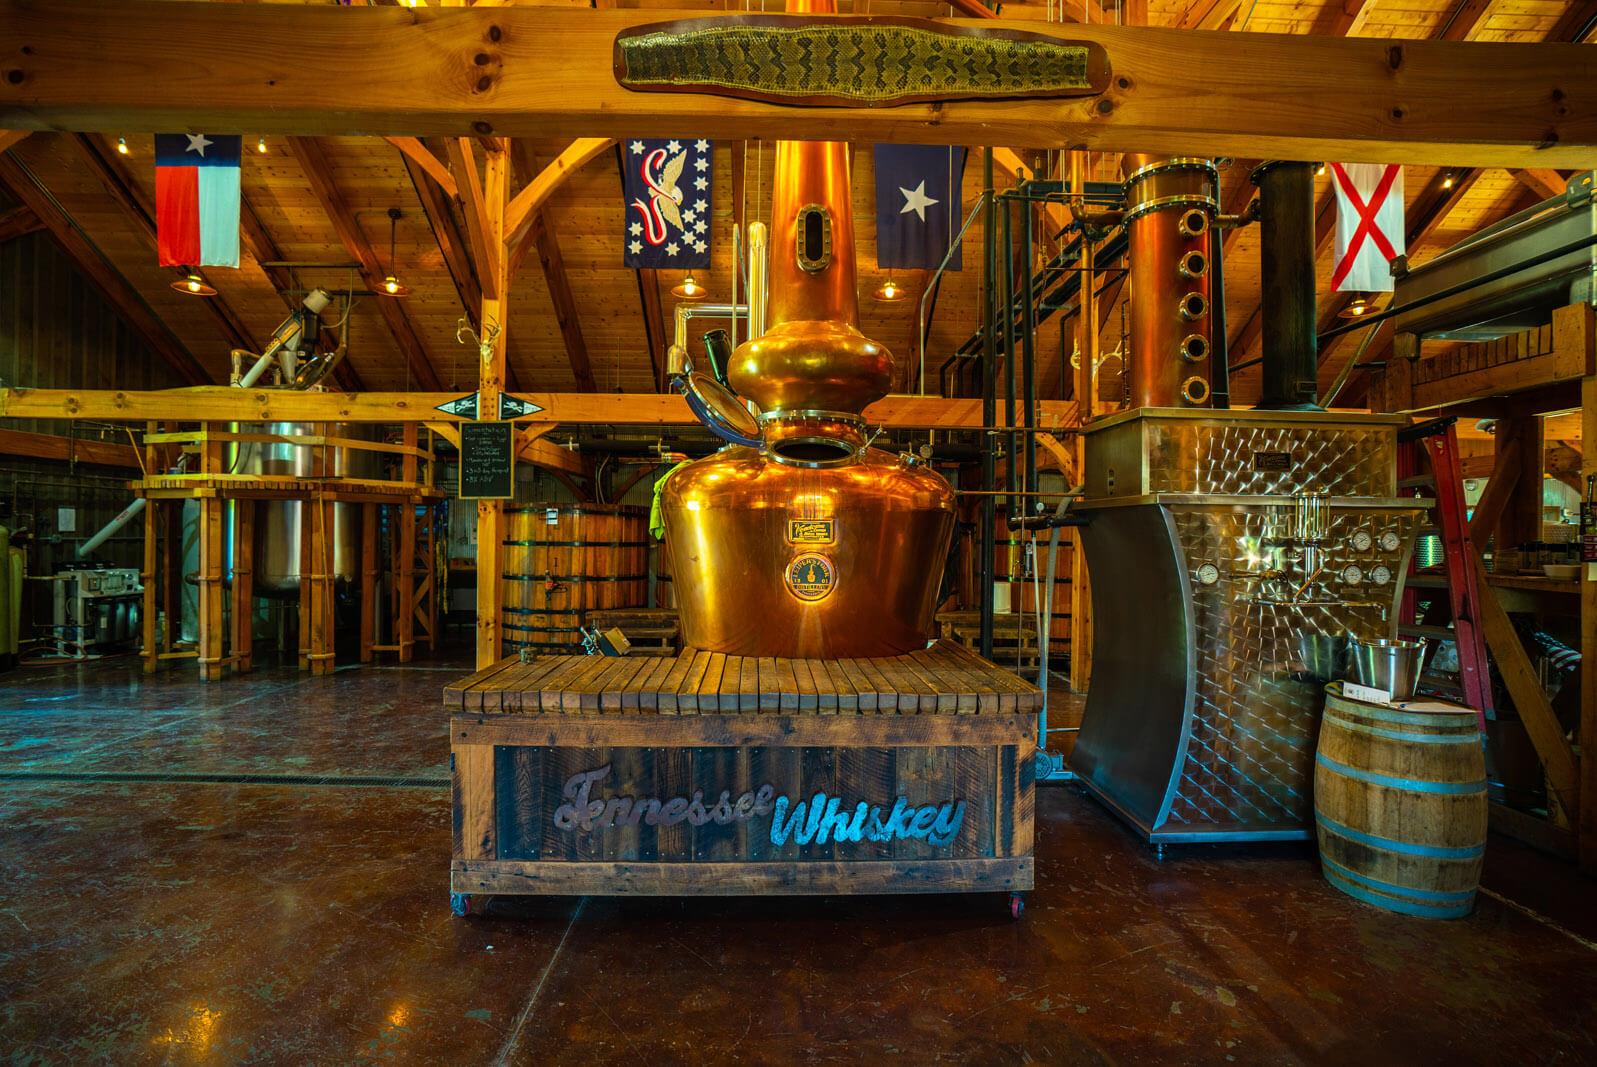 Leipers Fork Distilling distills their whiskey near Franklin Tennessee